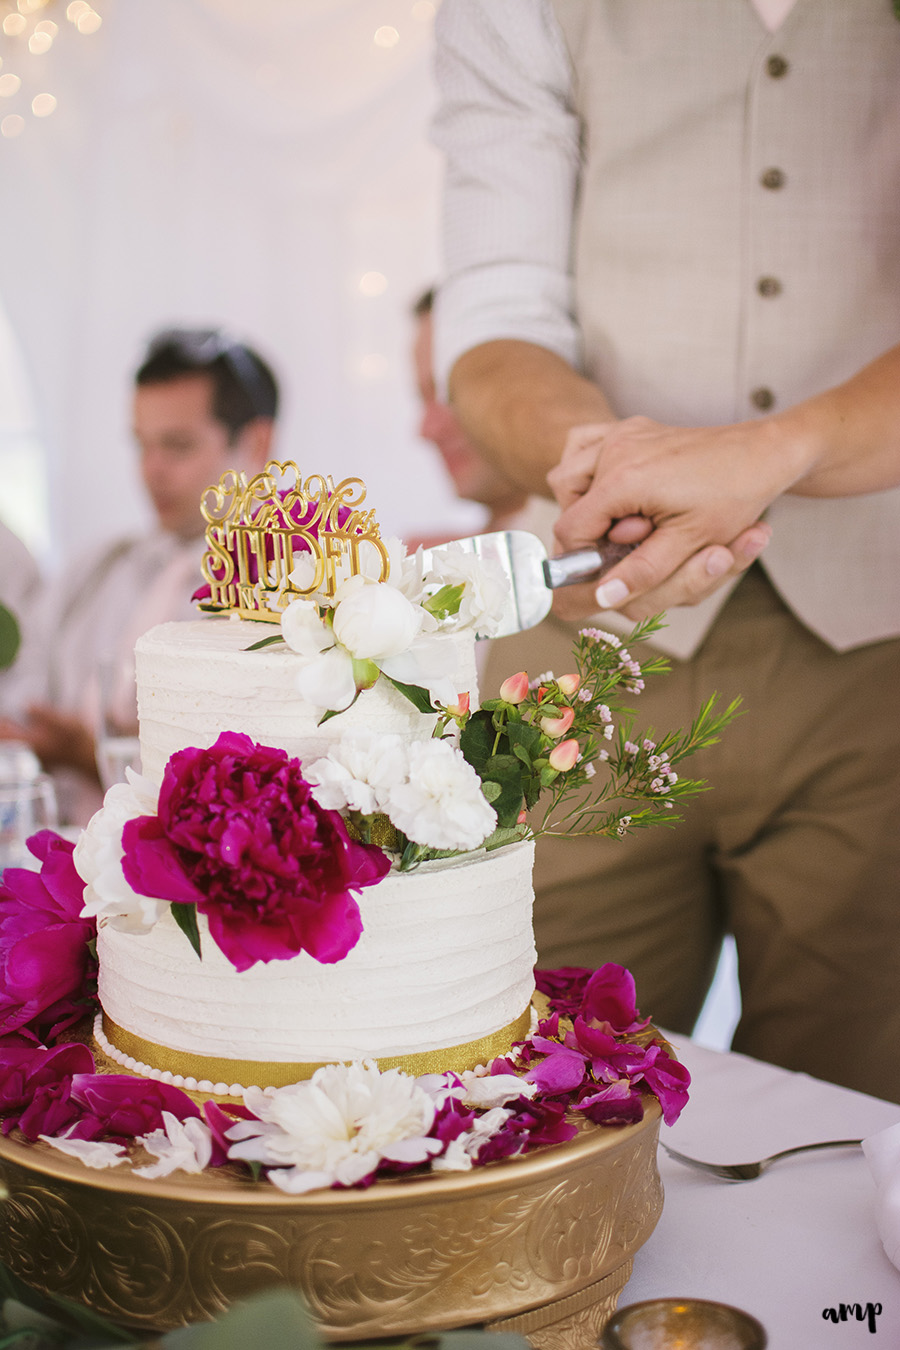 cutting the cake | Ali and Joe's #gardenwedding by amanda.matilda.photography | Colorado Wedding Photographer